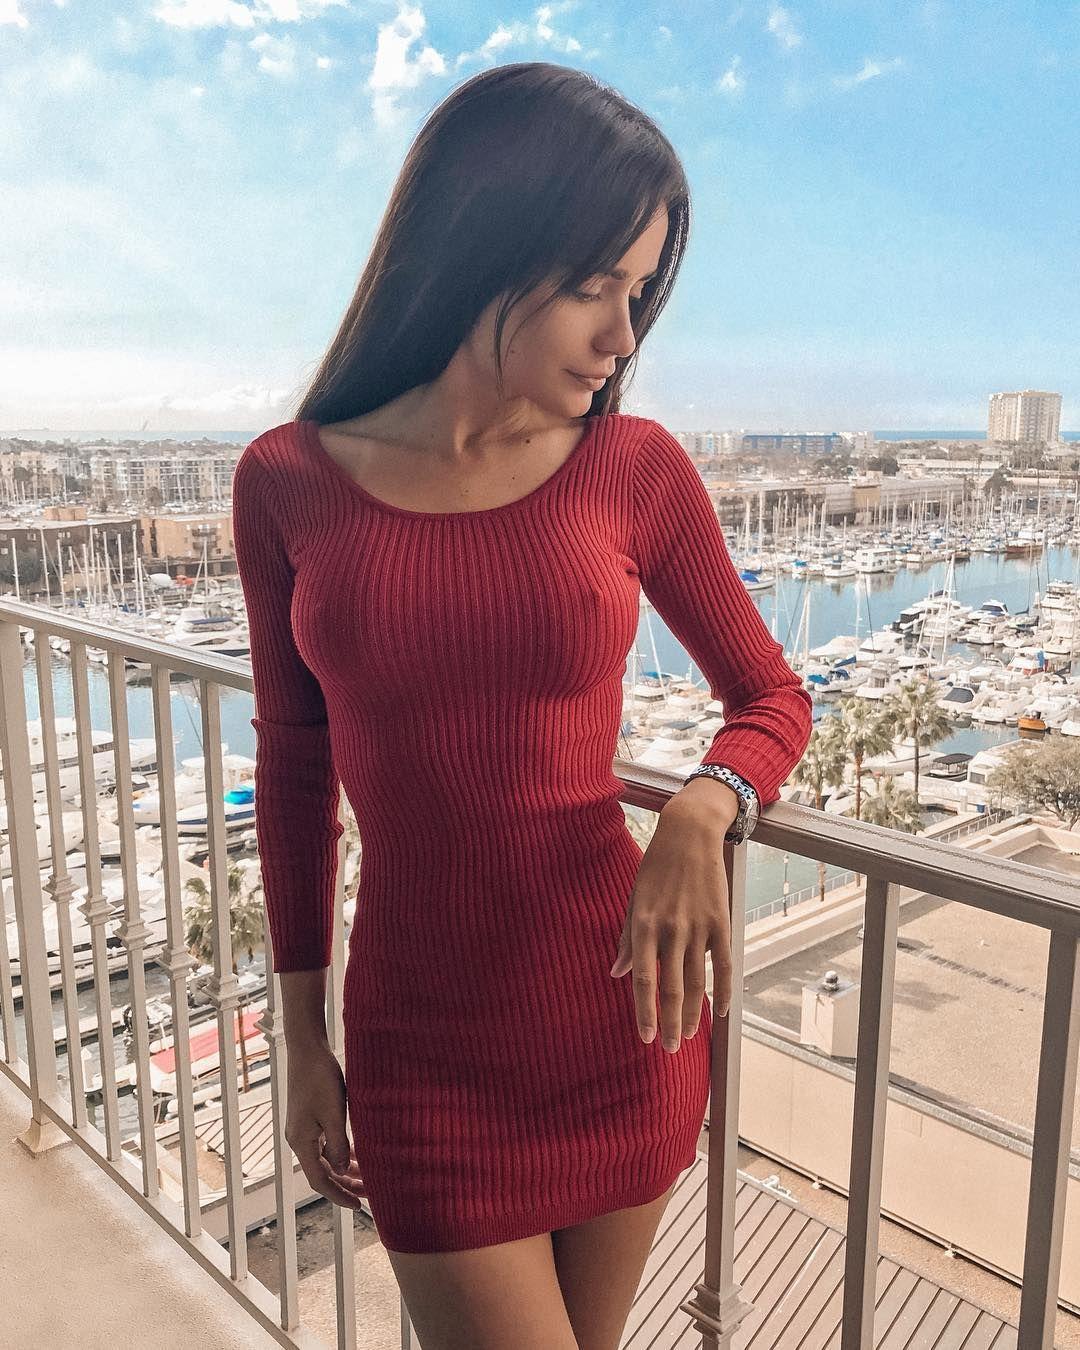 Selfie Ekaterina Zueva nude photos 2019